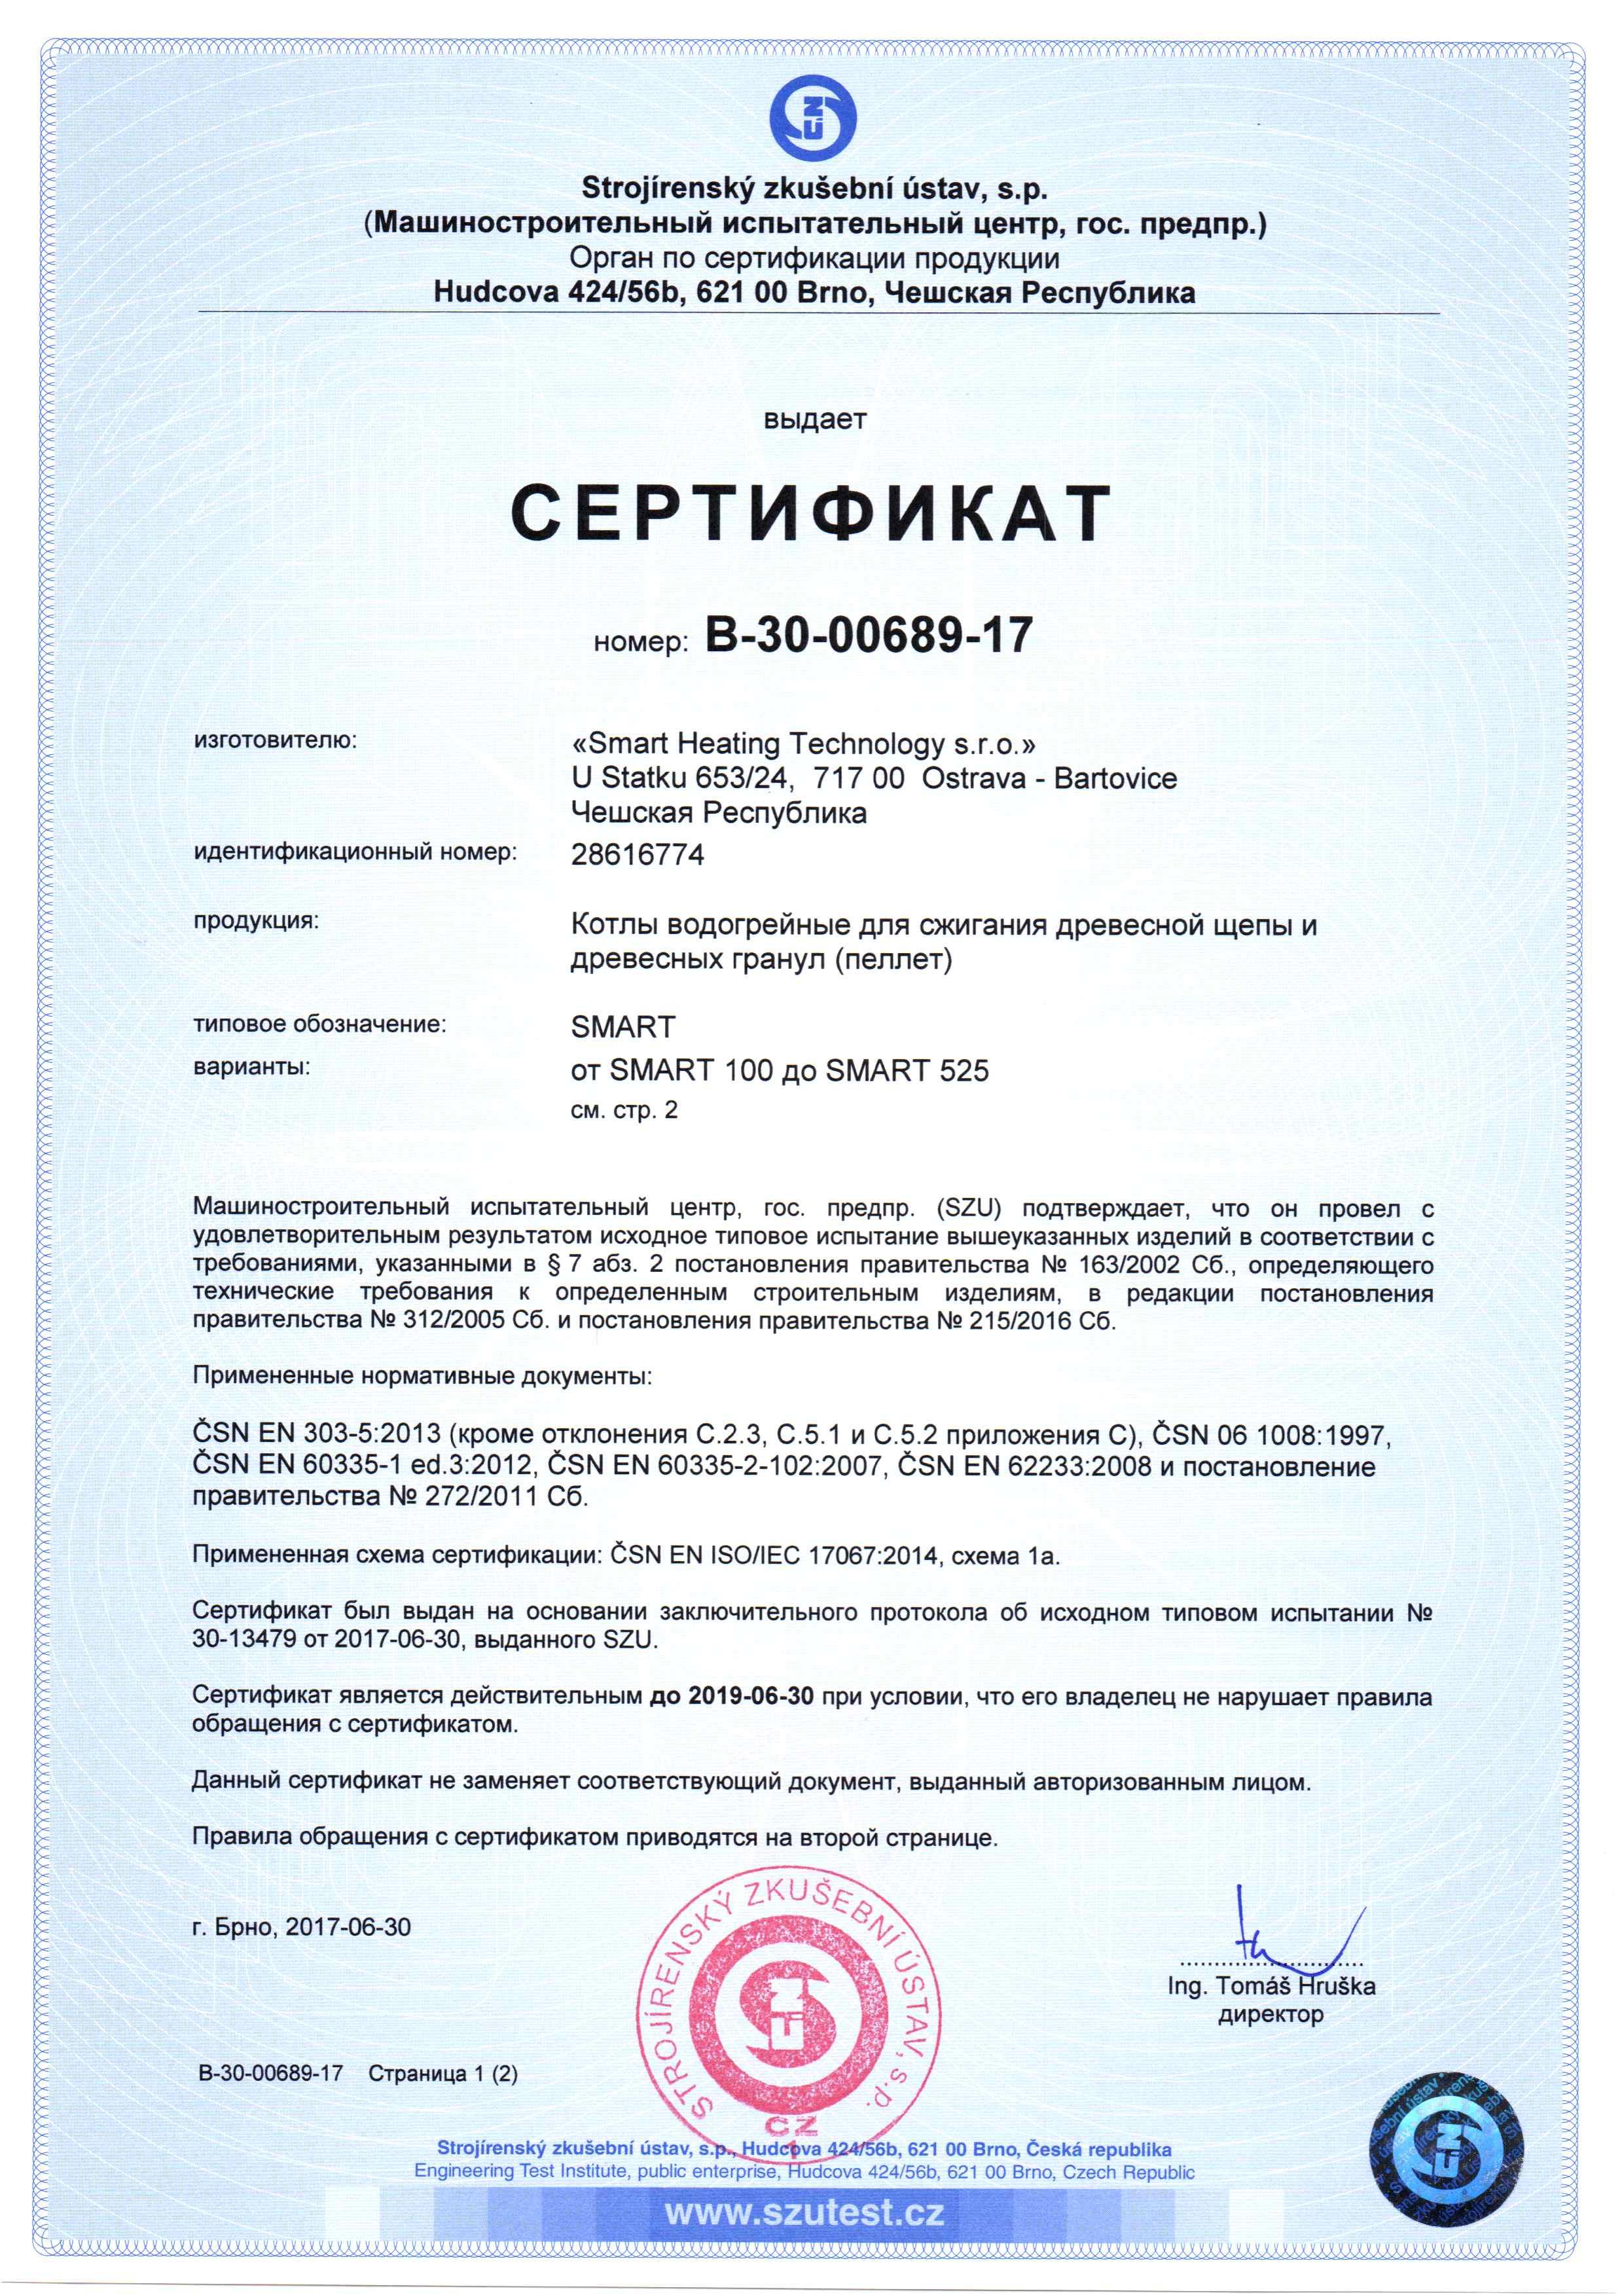 certifikat-b-30-00689-17-ru_stranka_1